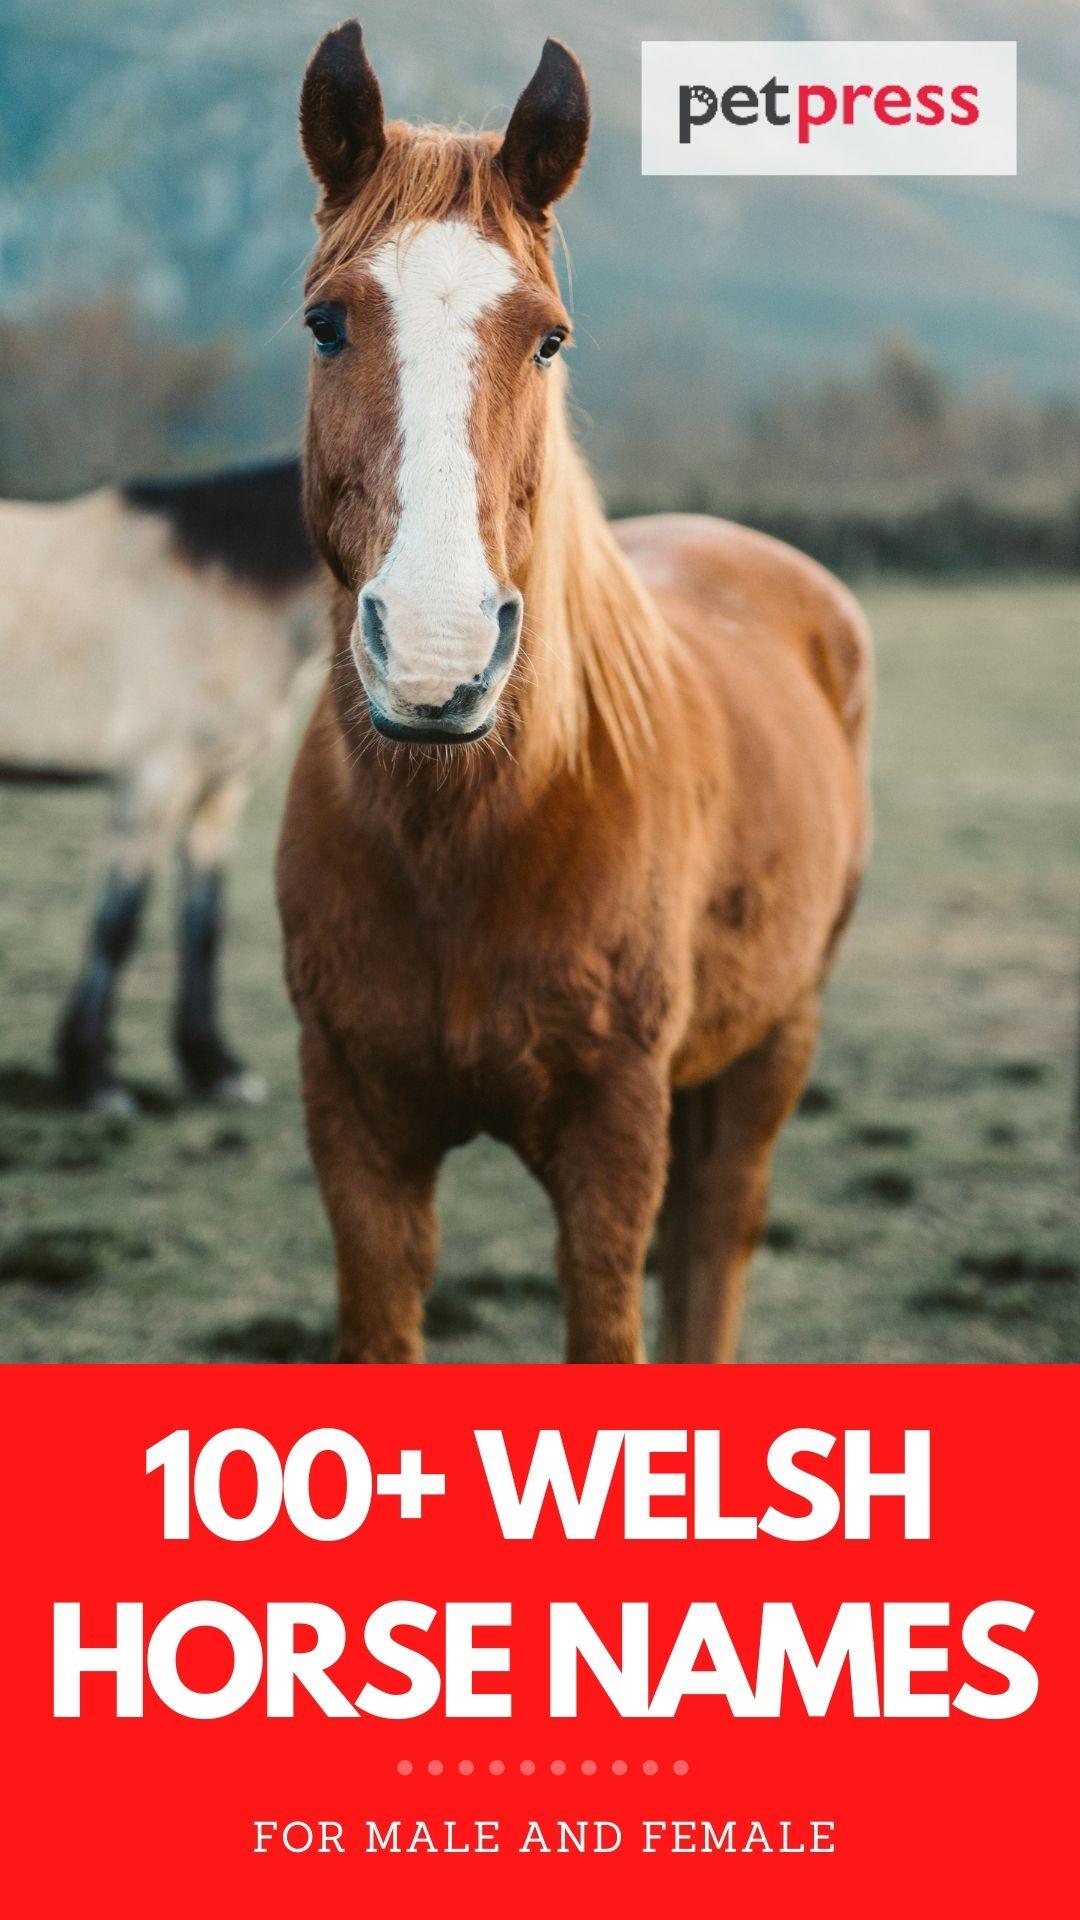 100+ welsh horse names